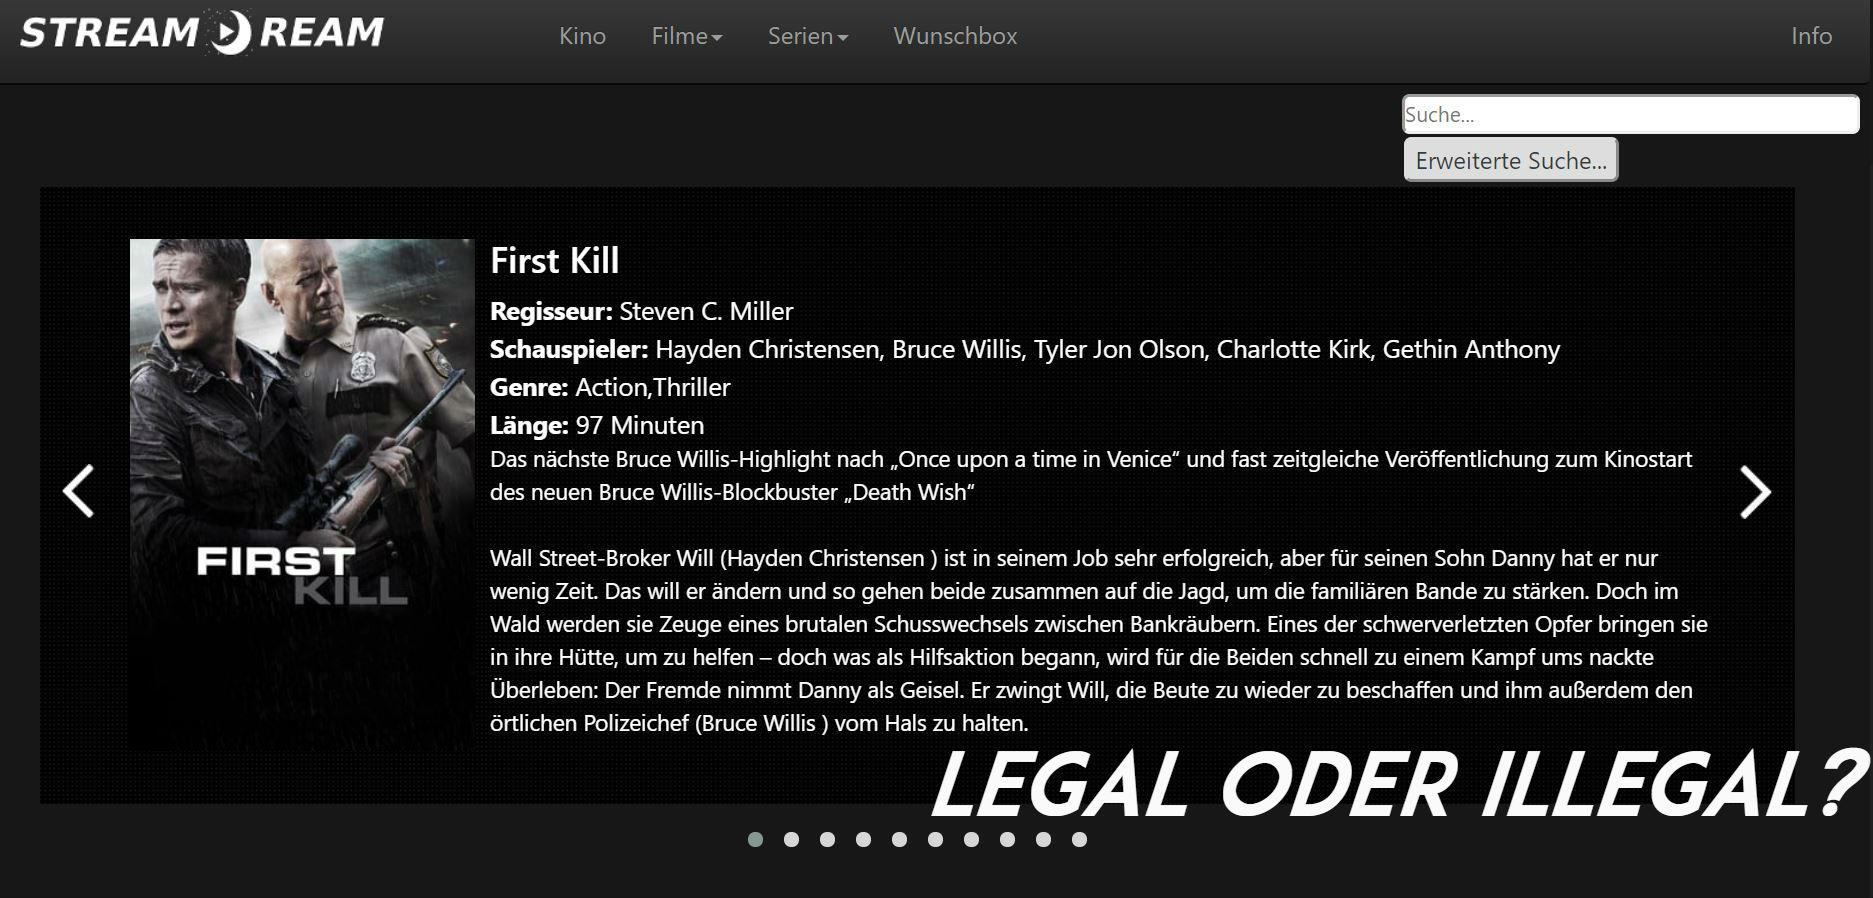 Topstreamfilm Illegal